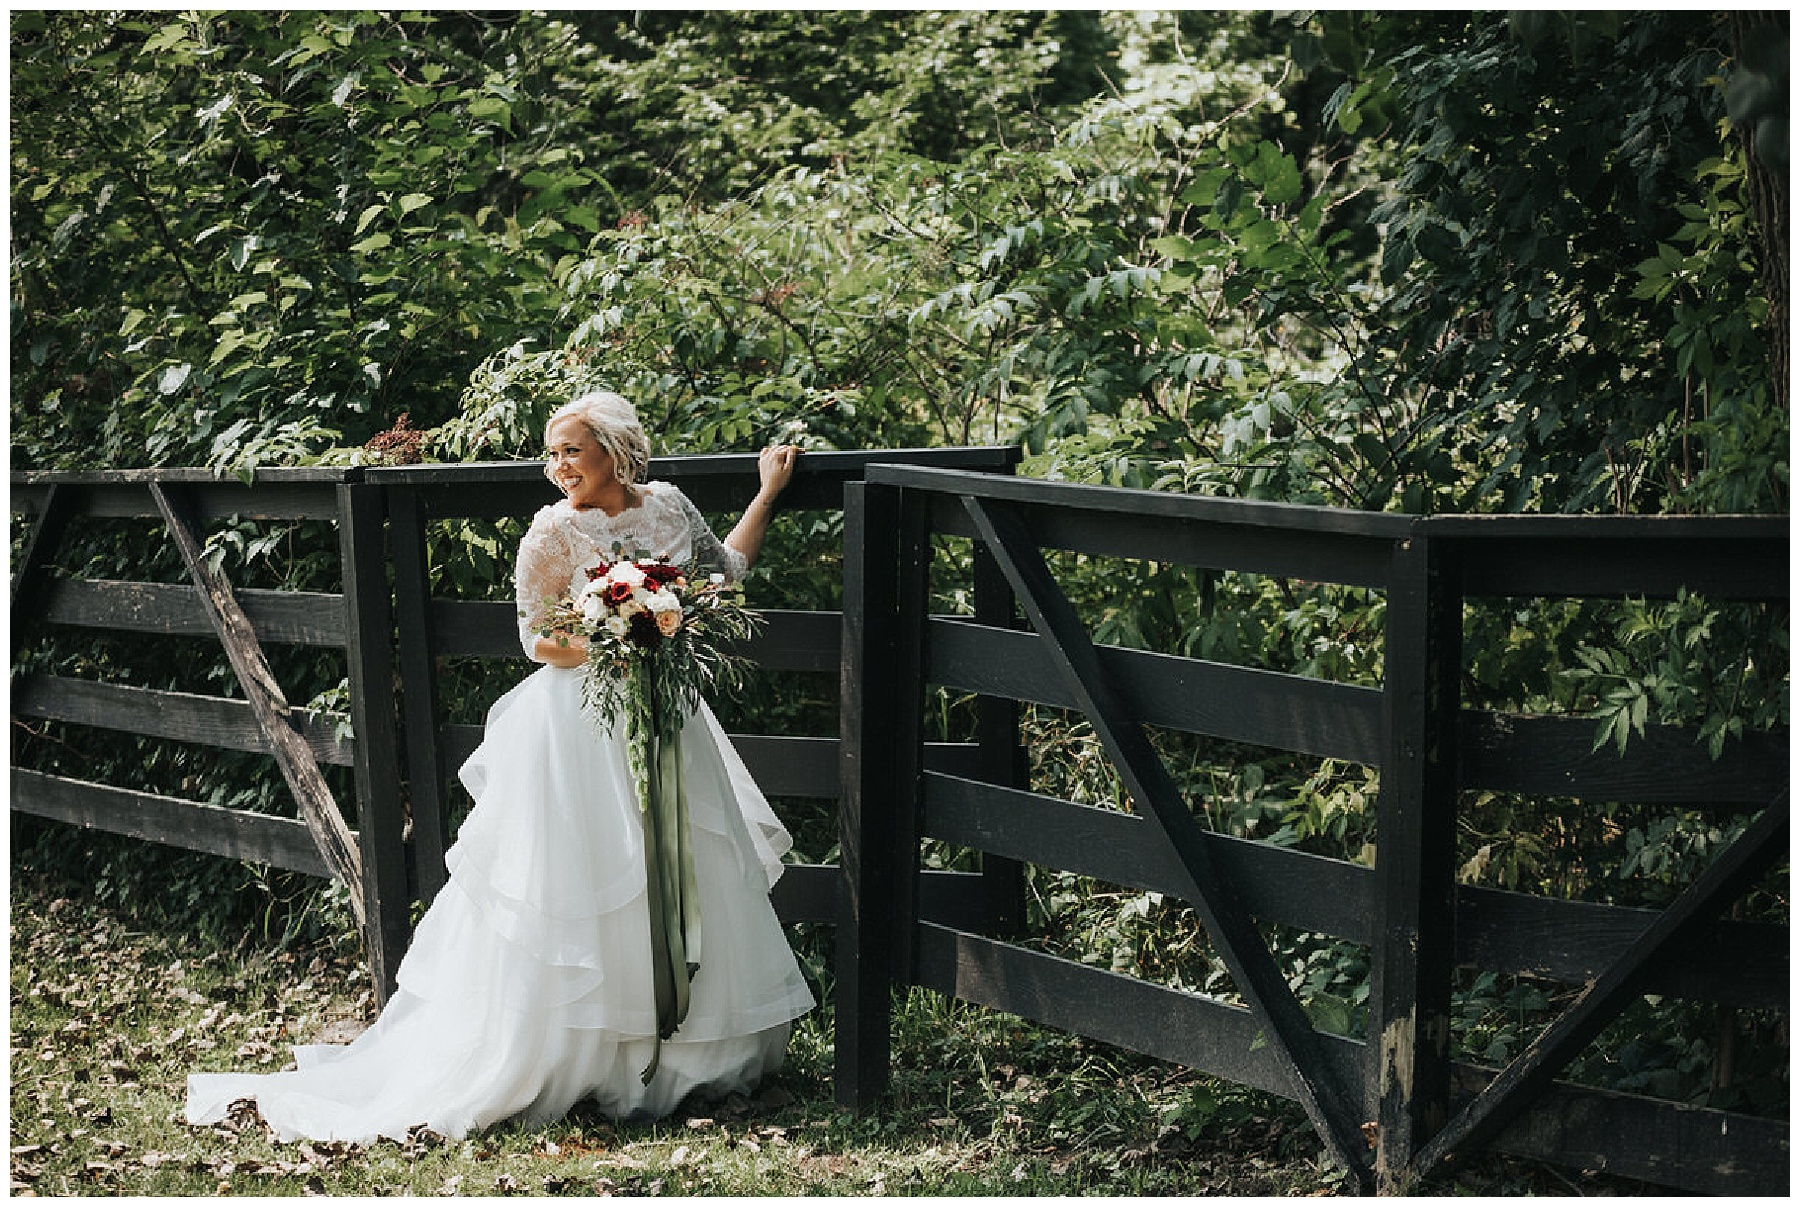 Webster City, IA Wedding